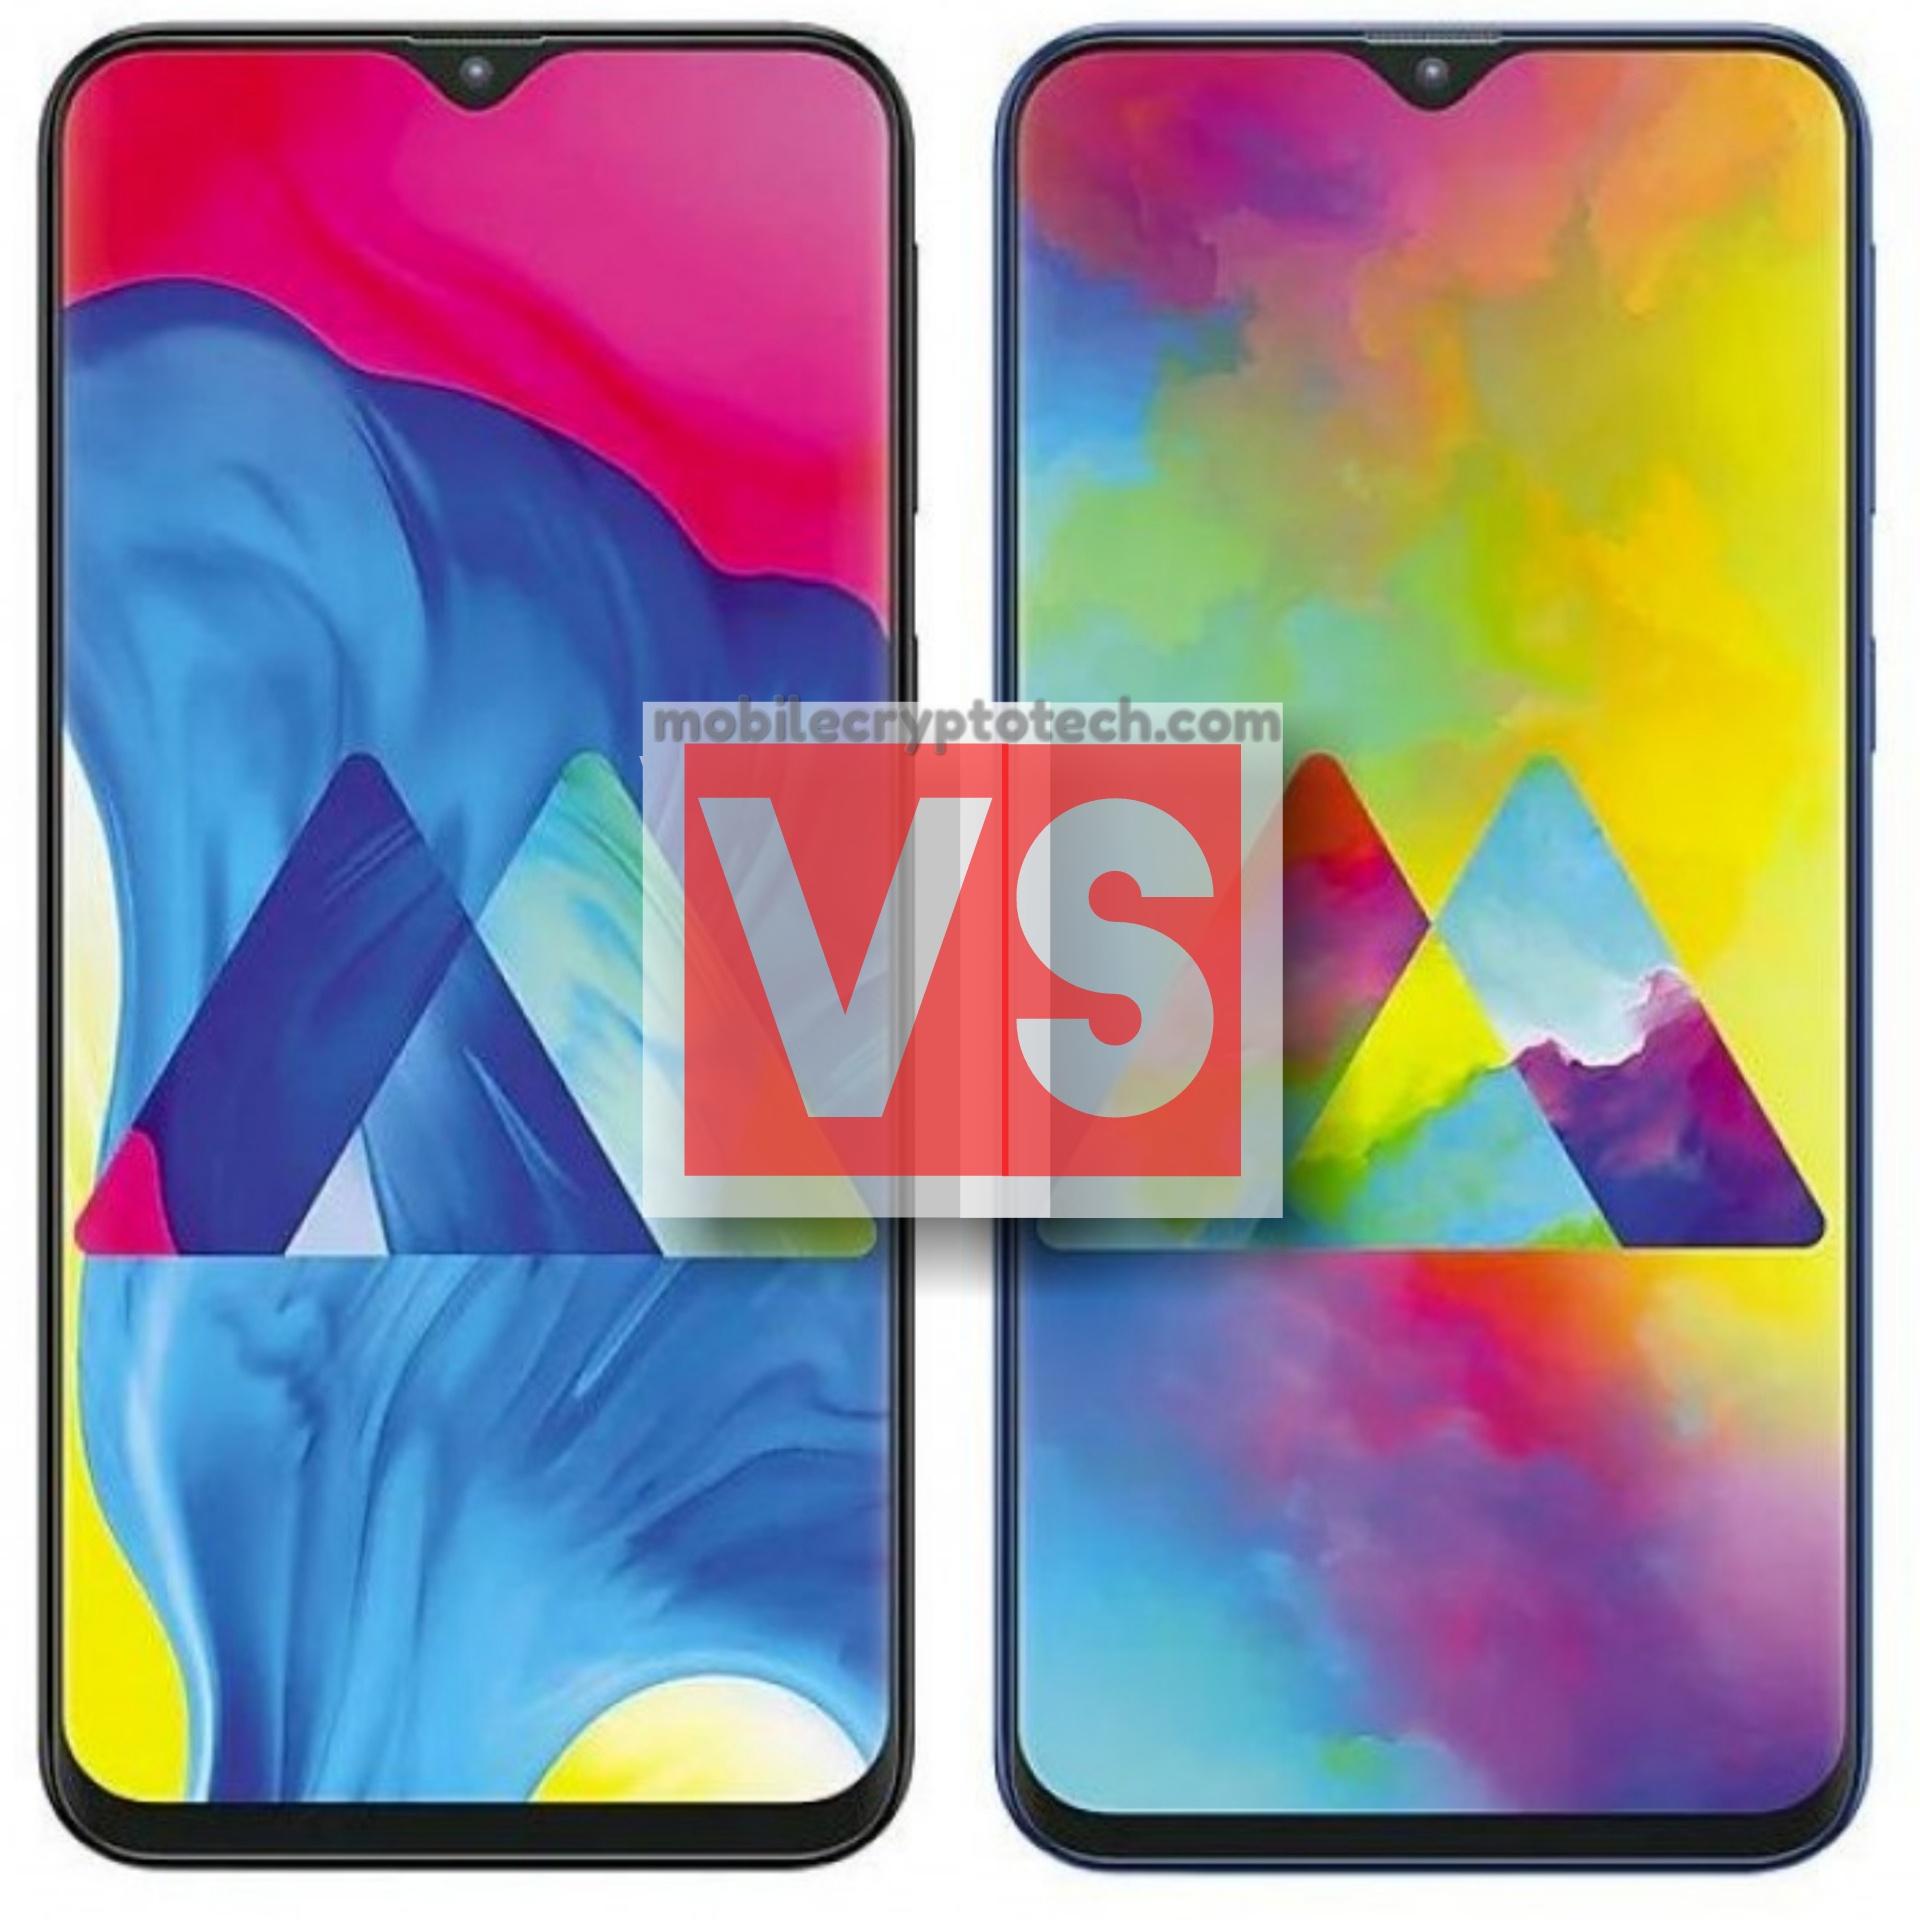 Samsung Galaxy M10 Vs M20